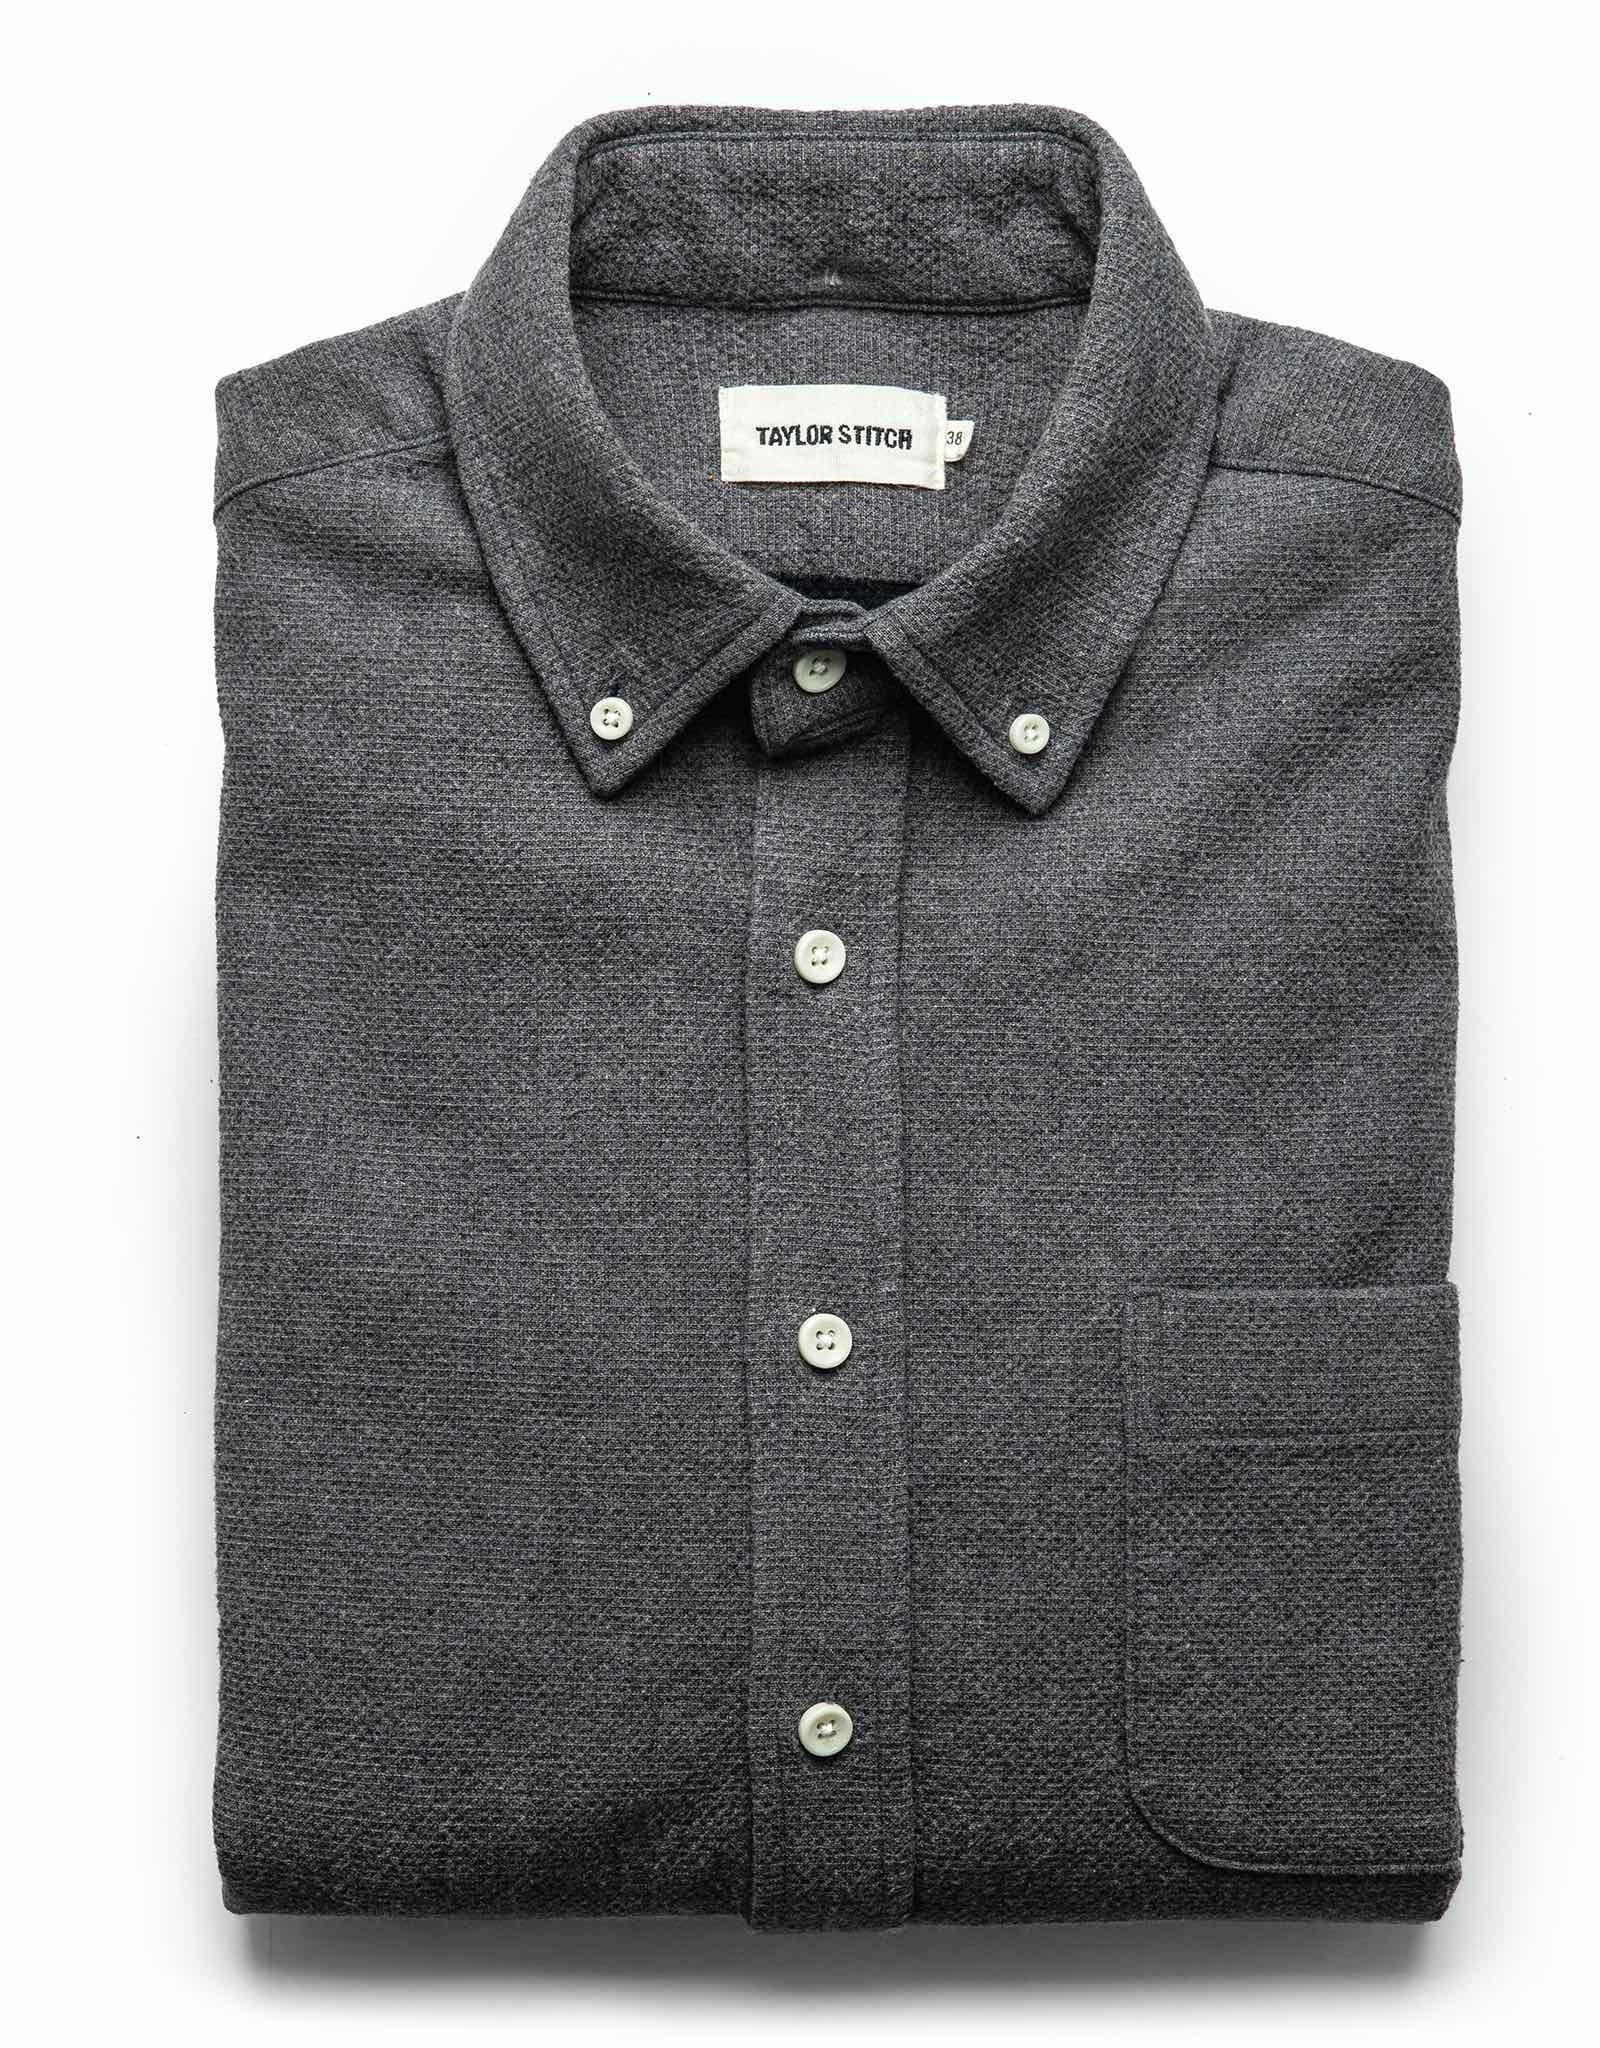 Taylor Stitch  Jack Shirt Double Cloth